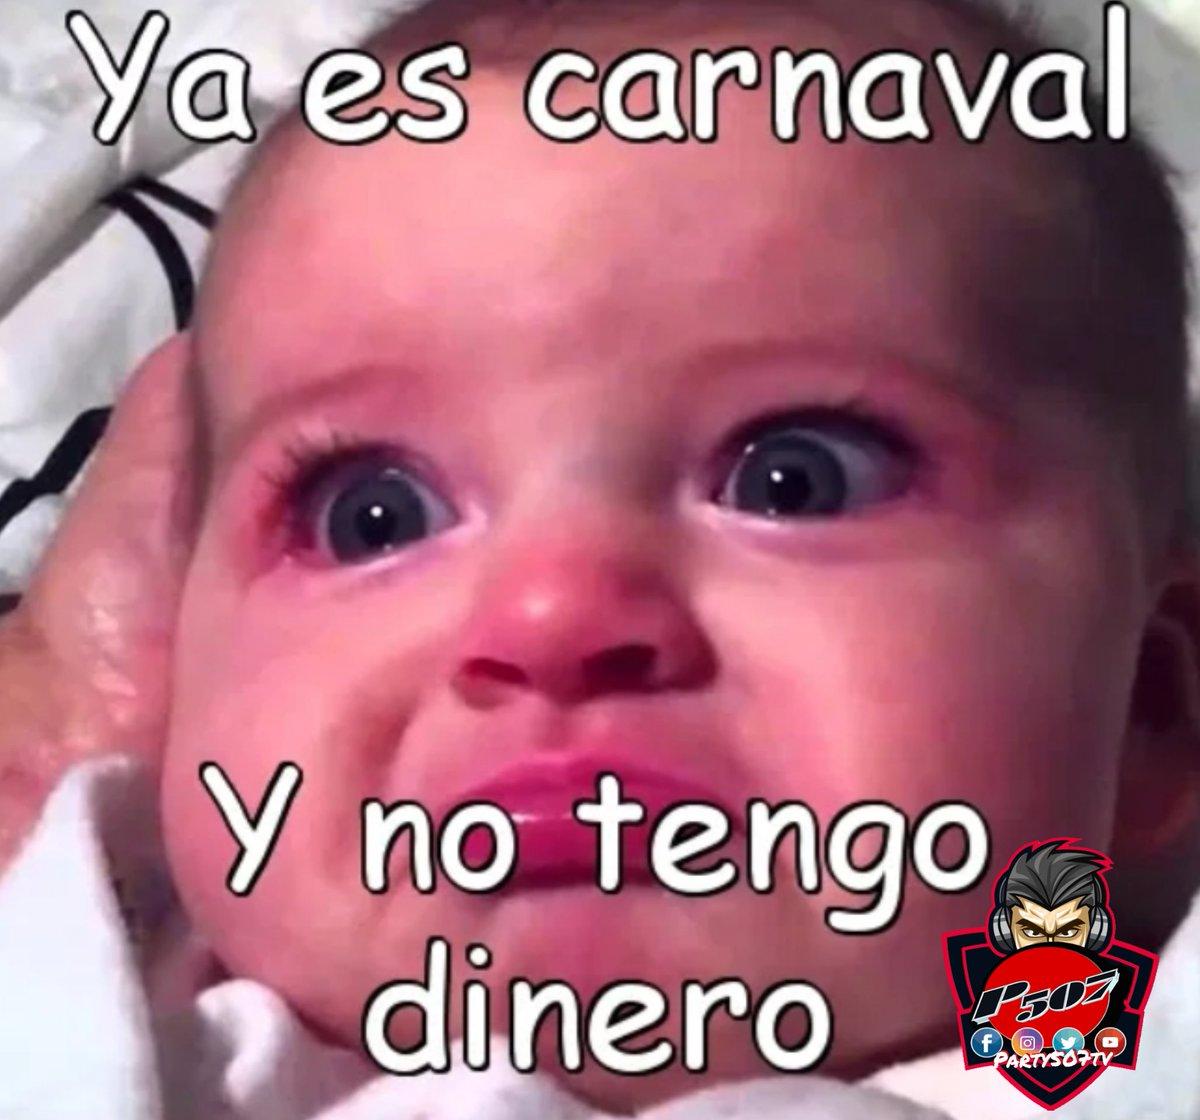 #party507tv #memes #humor #humornegro #humoramarillo #humorista #humorgrafico #risa #risas #videosderisas #videosgraciosos #videoviral #risasaseguradas #risascontagiosas #risasymasrisas #graciosopic.twitter.com/PlZvFkxWeD